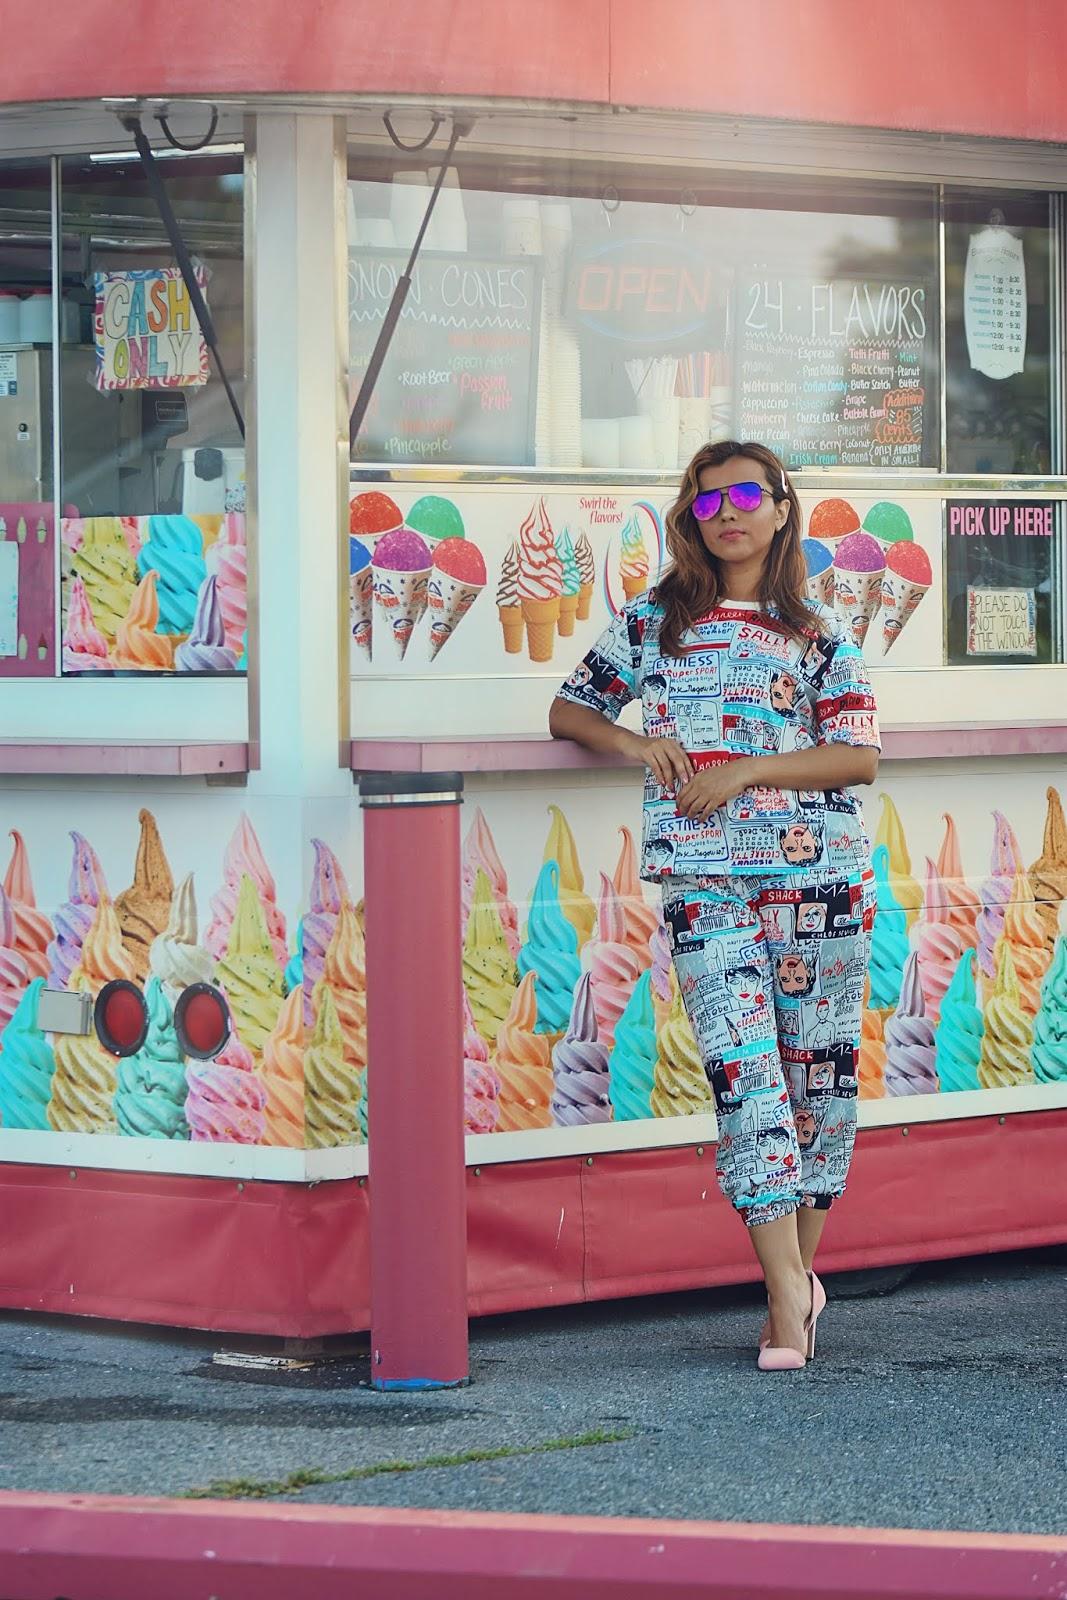 Comic Print Tee - Drawstring Waist Pants-mariestilo-shein-sheingals-fashionblogger-dcblogger-marisolflamenco-virginia is for lovers-fashionista-street wear-armandhugon-modaelsalvador-viajeros por el mundo-